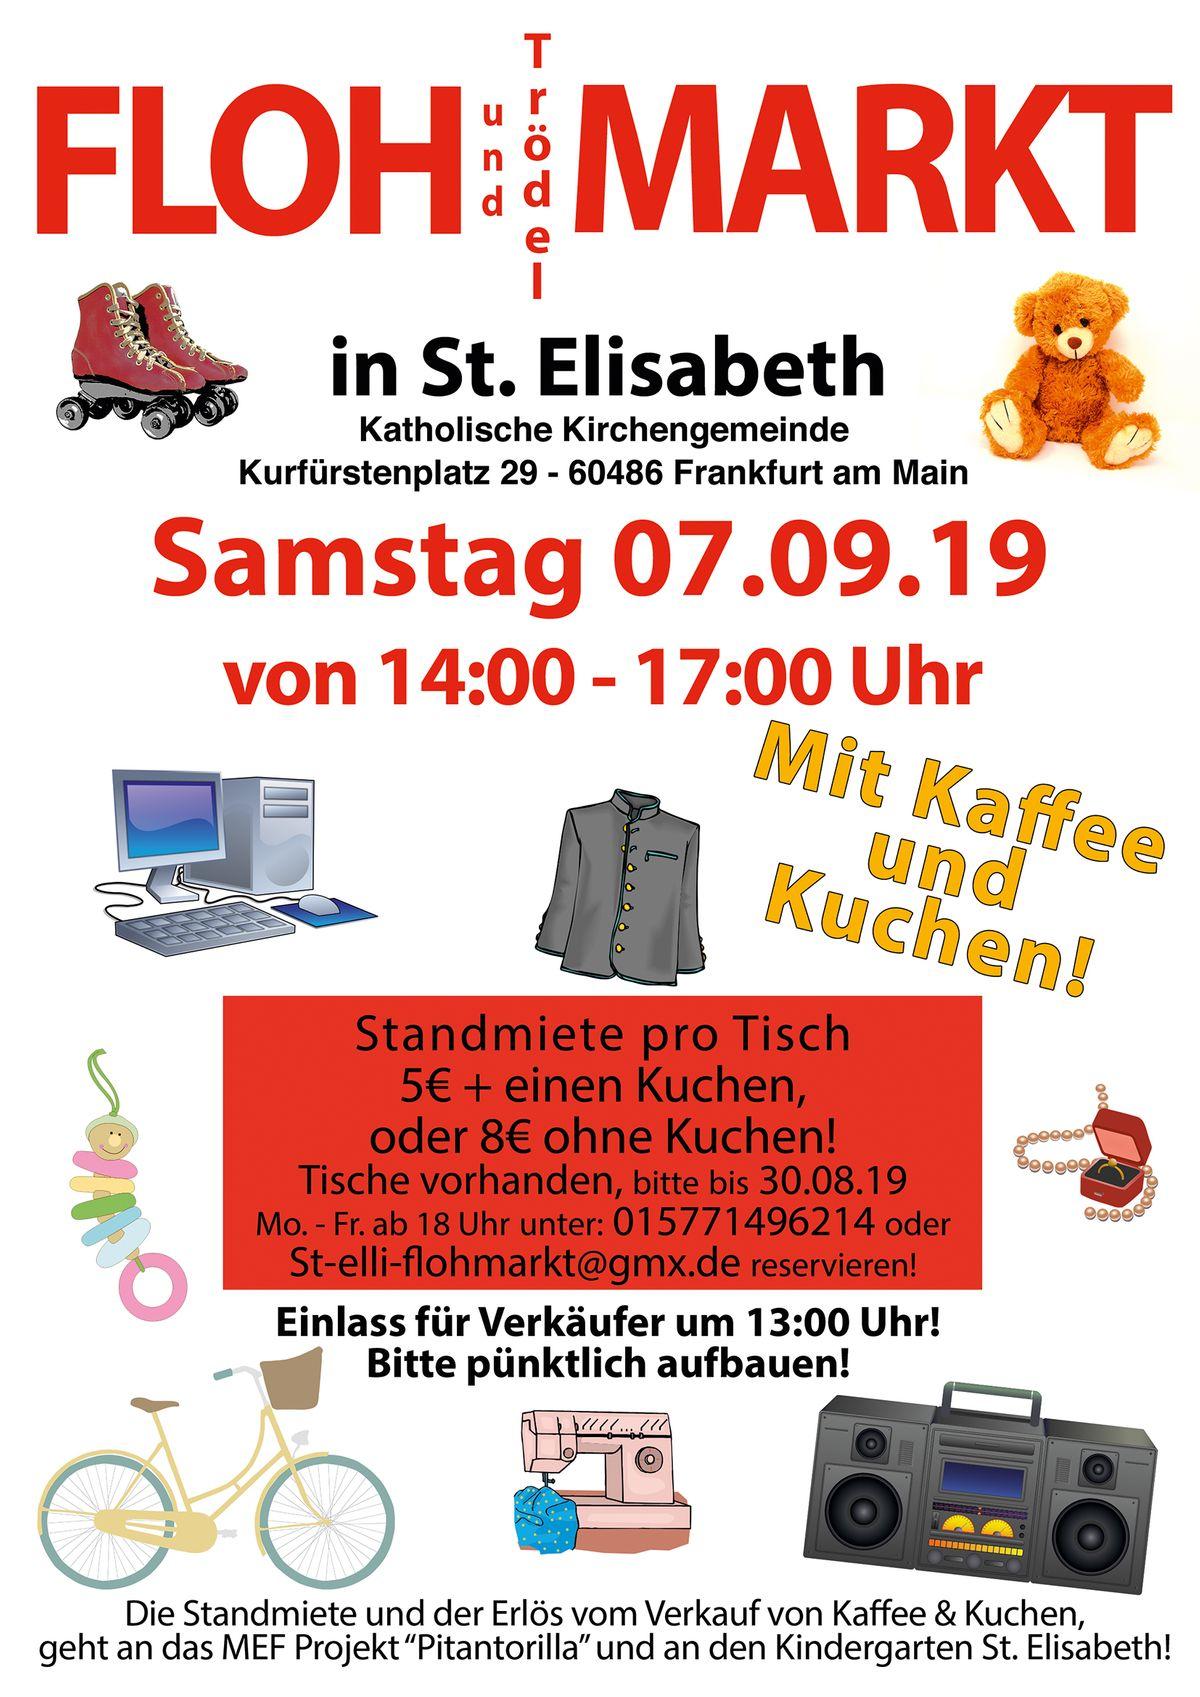 Flohmarkt in St. Elisabeth: Samstag, 07.09.2019, 14 bis 17 Uhr